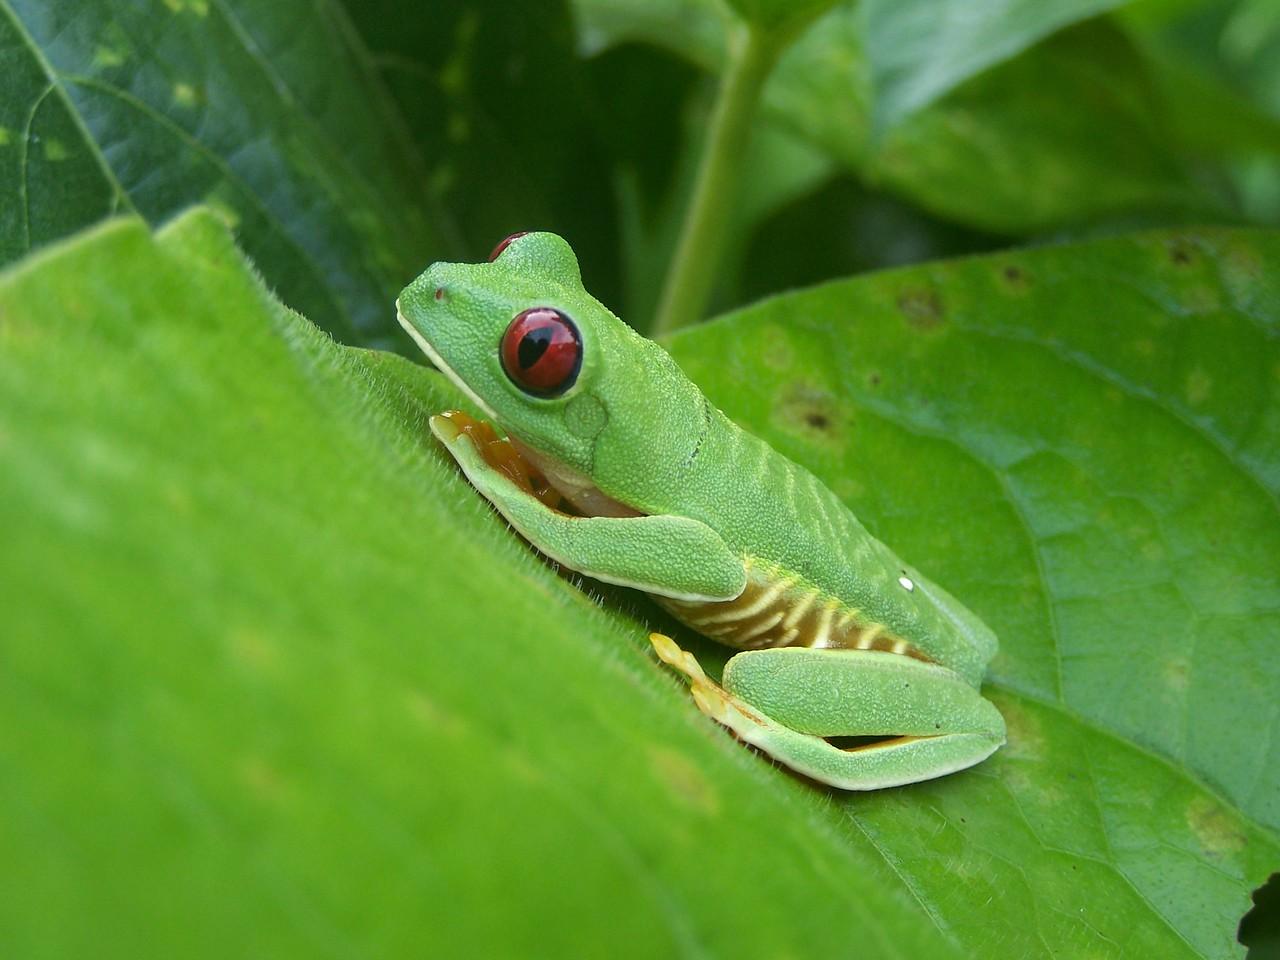 Hacienda Baru, Costa Rica. Red eyed tree frog.